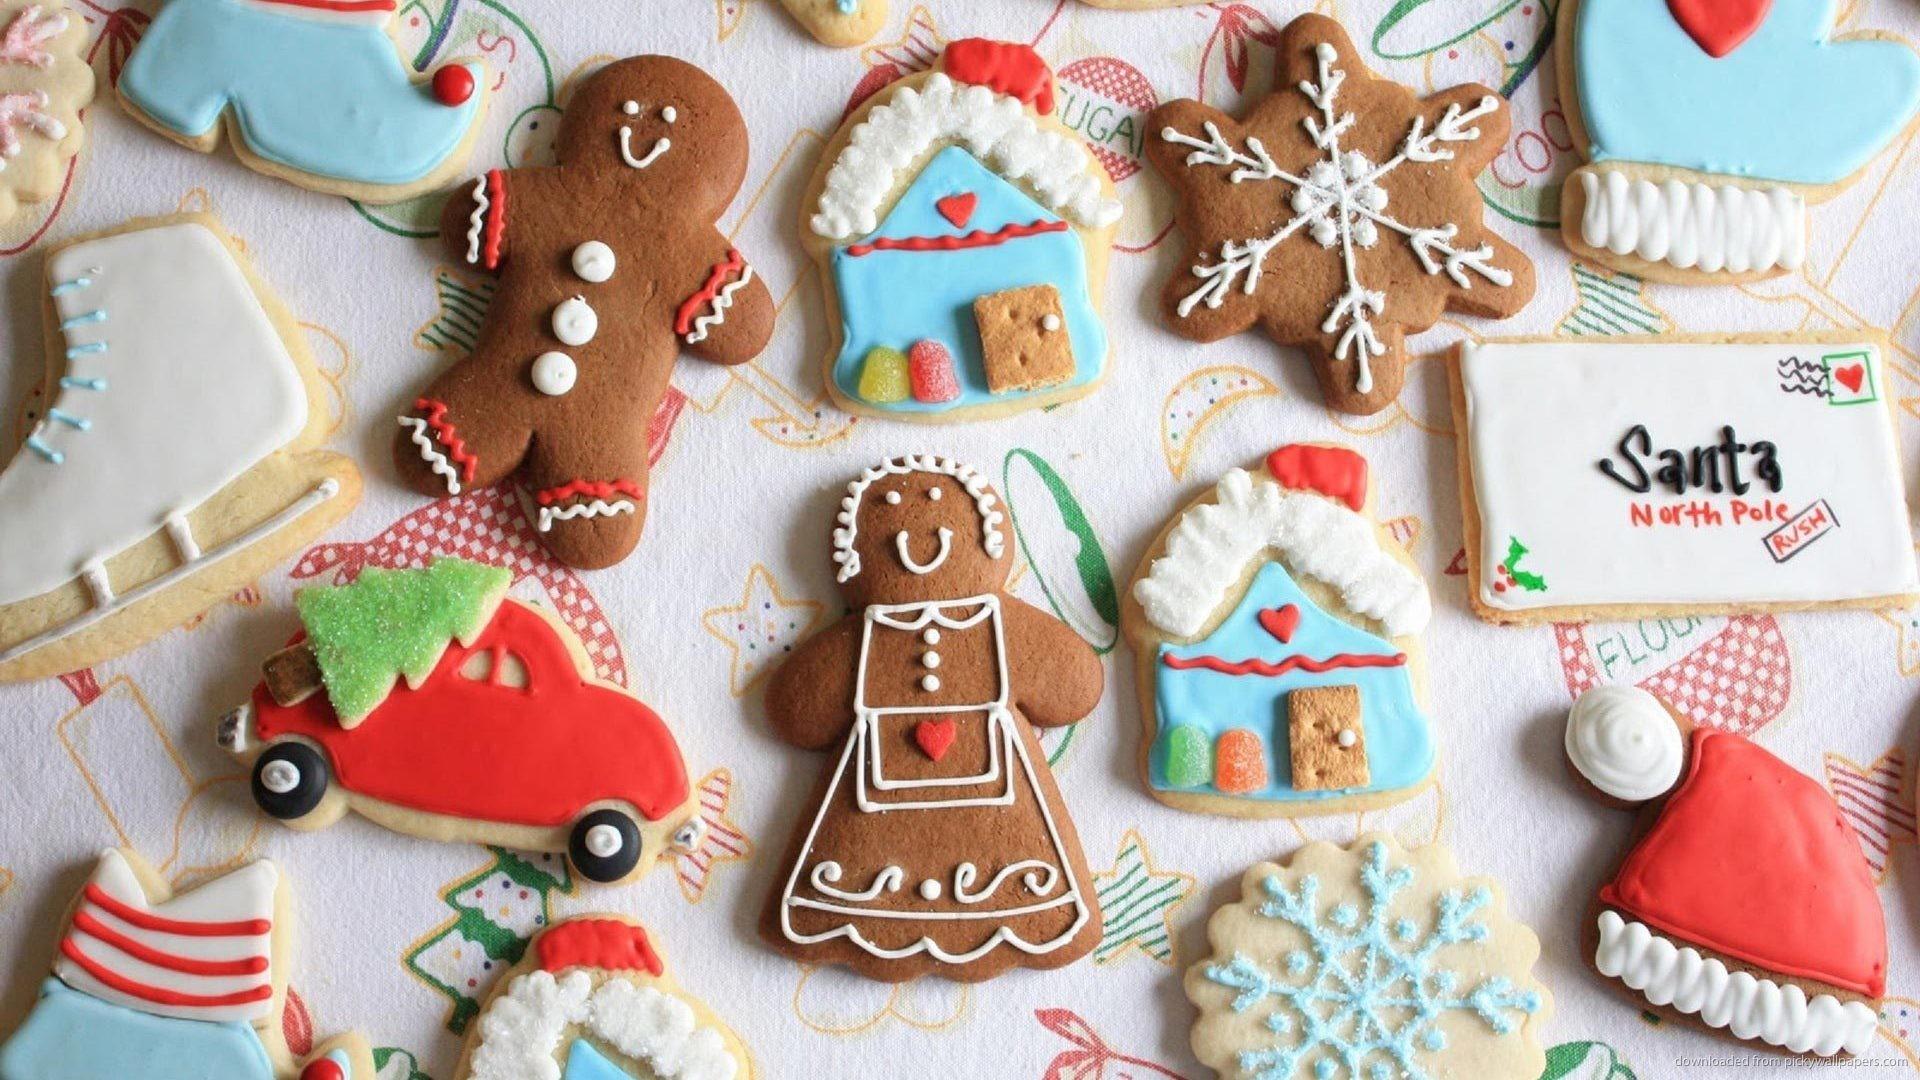 Res: 1920x1080, Cute Christmas Cookies Wallpaper